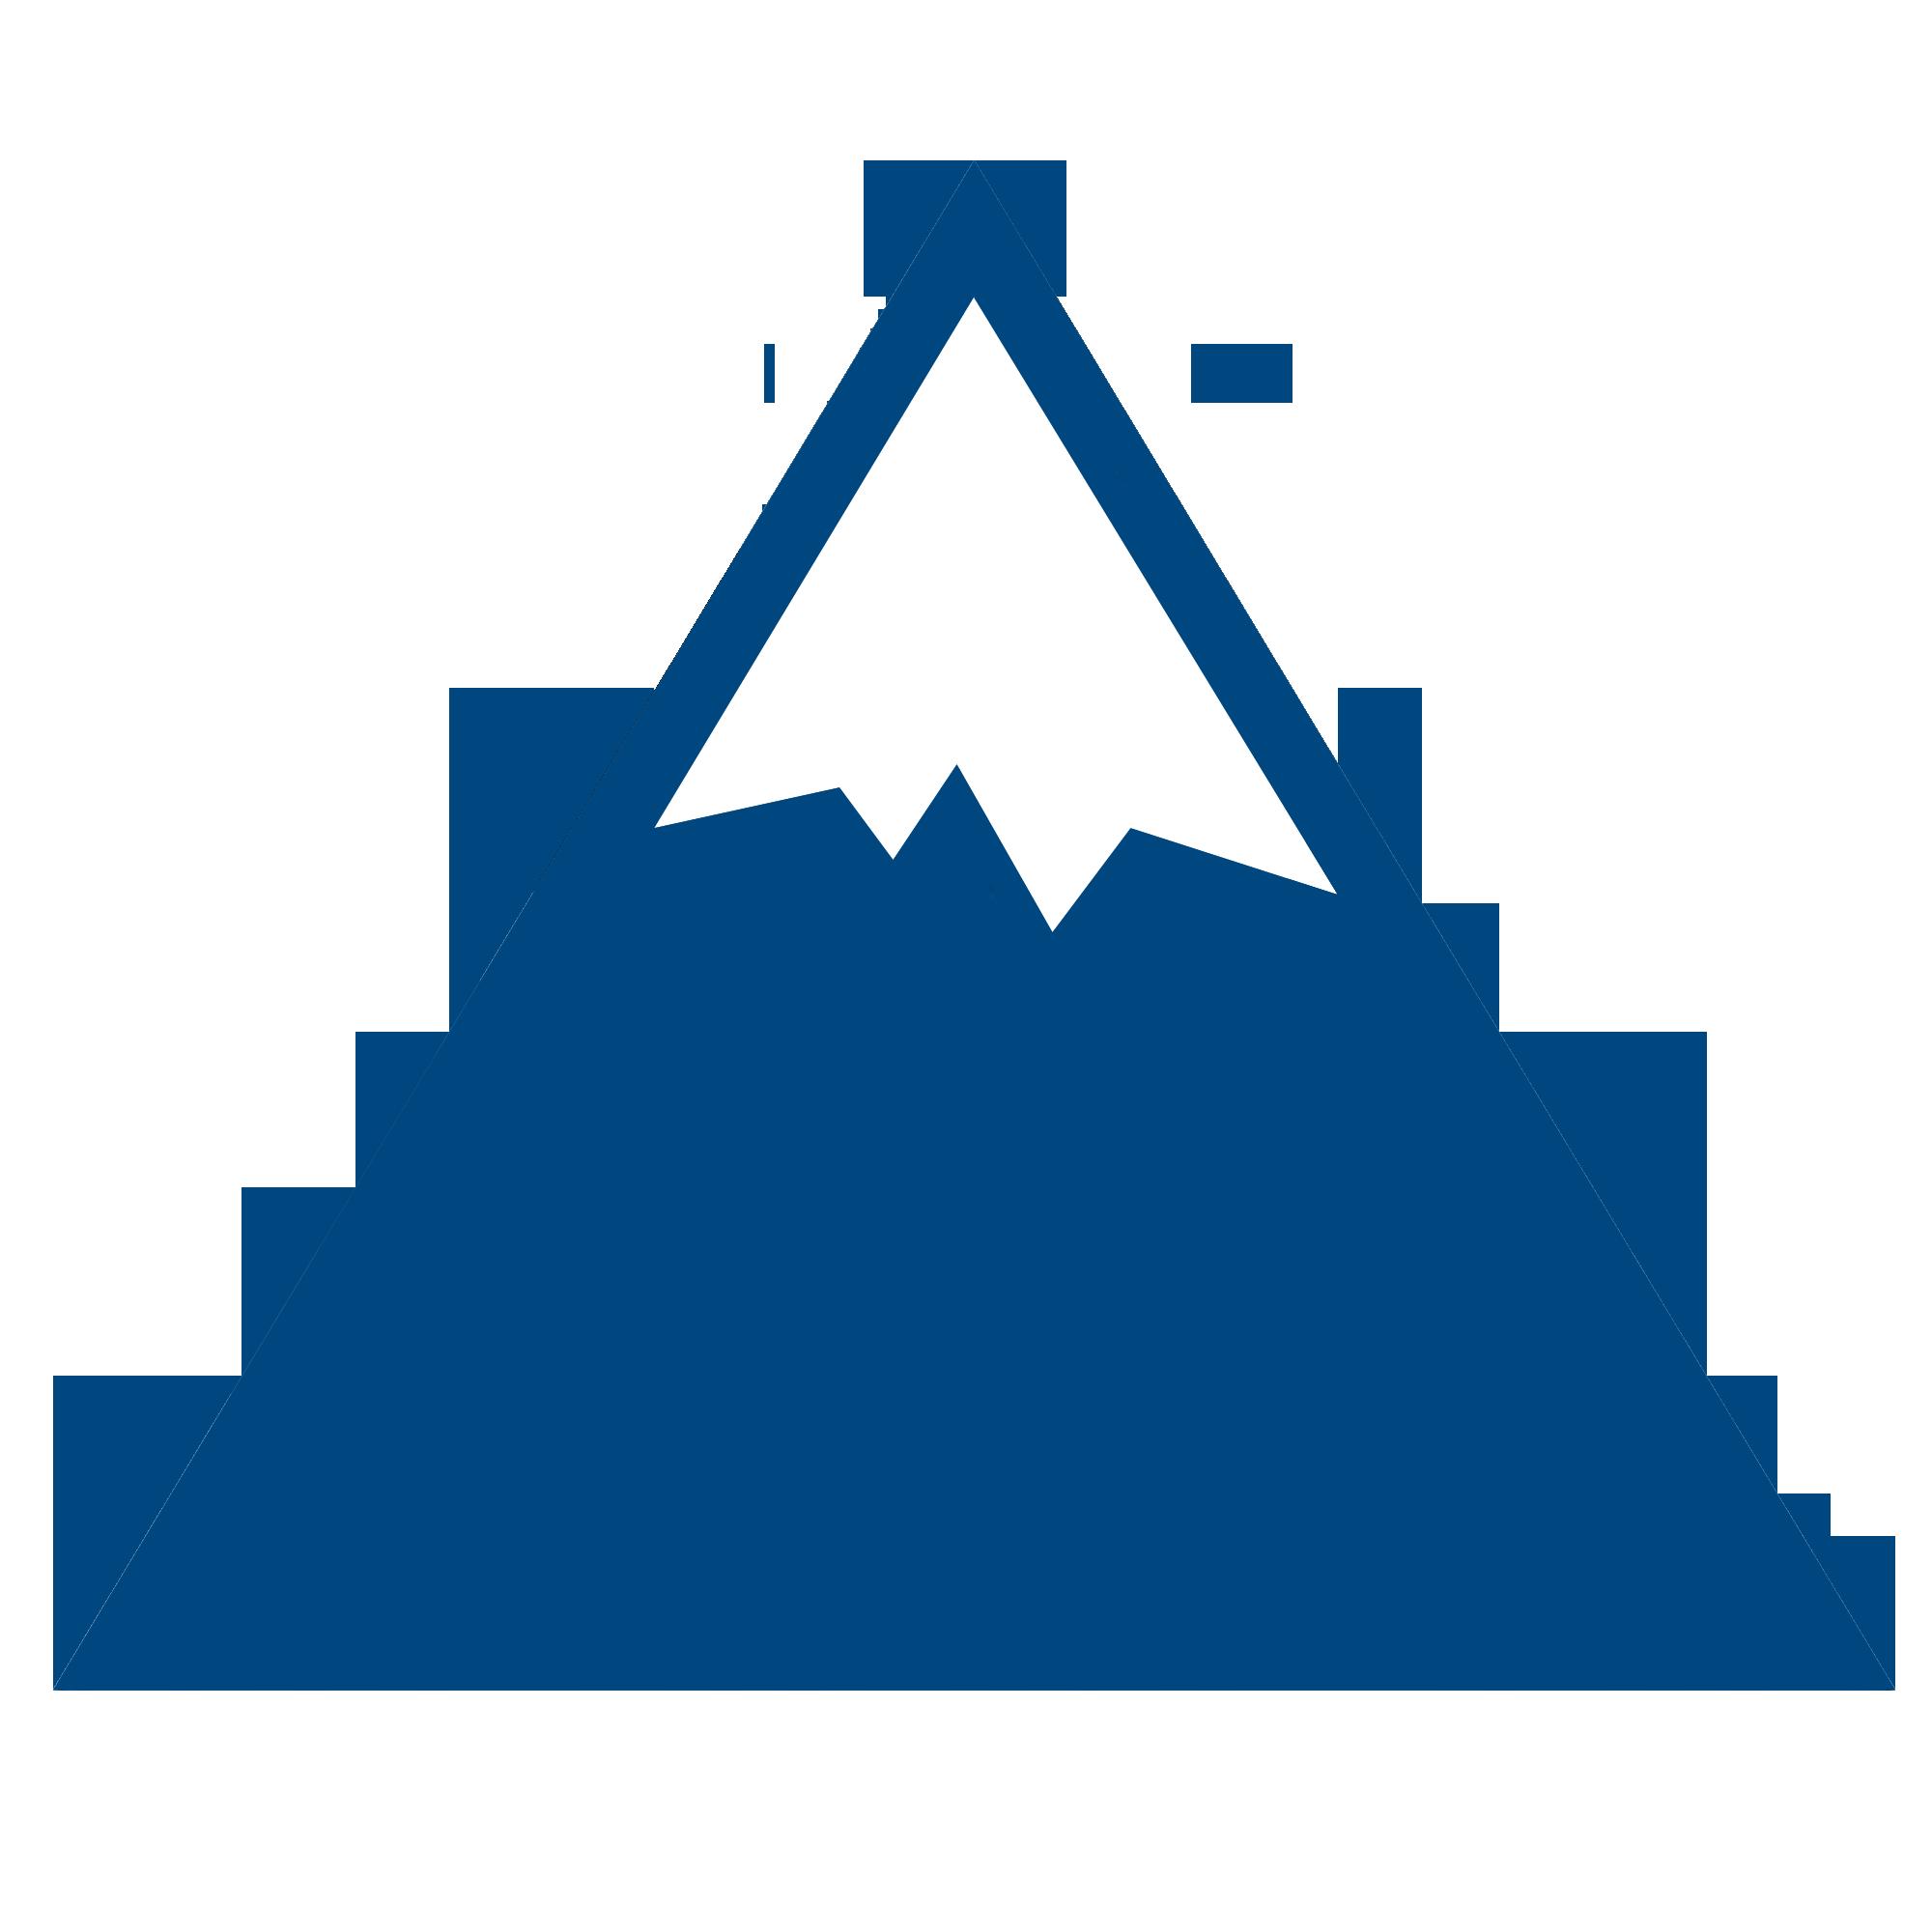 2000x1973 Sugar Loaf Mountain Clipart